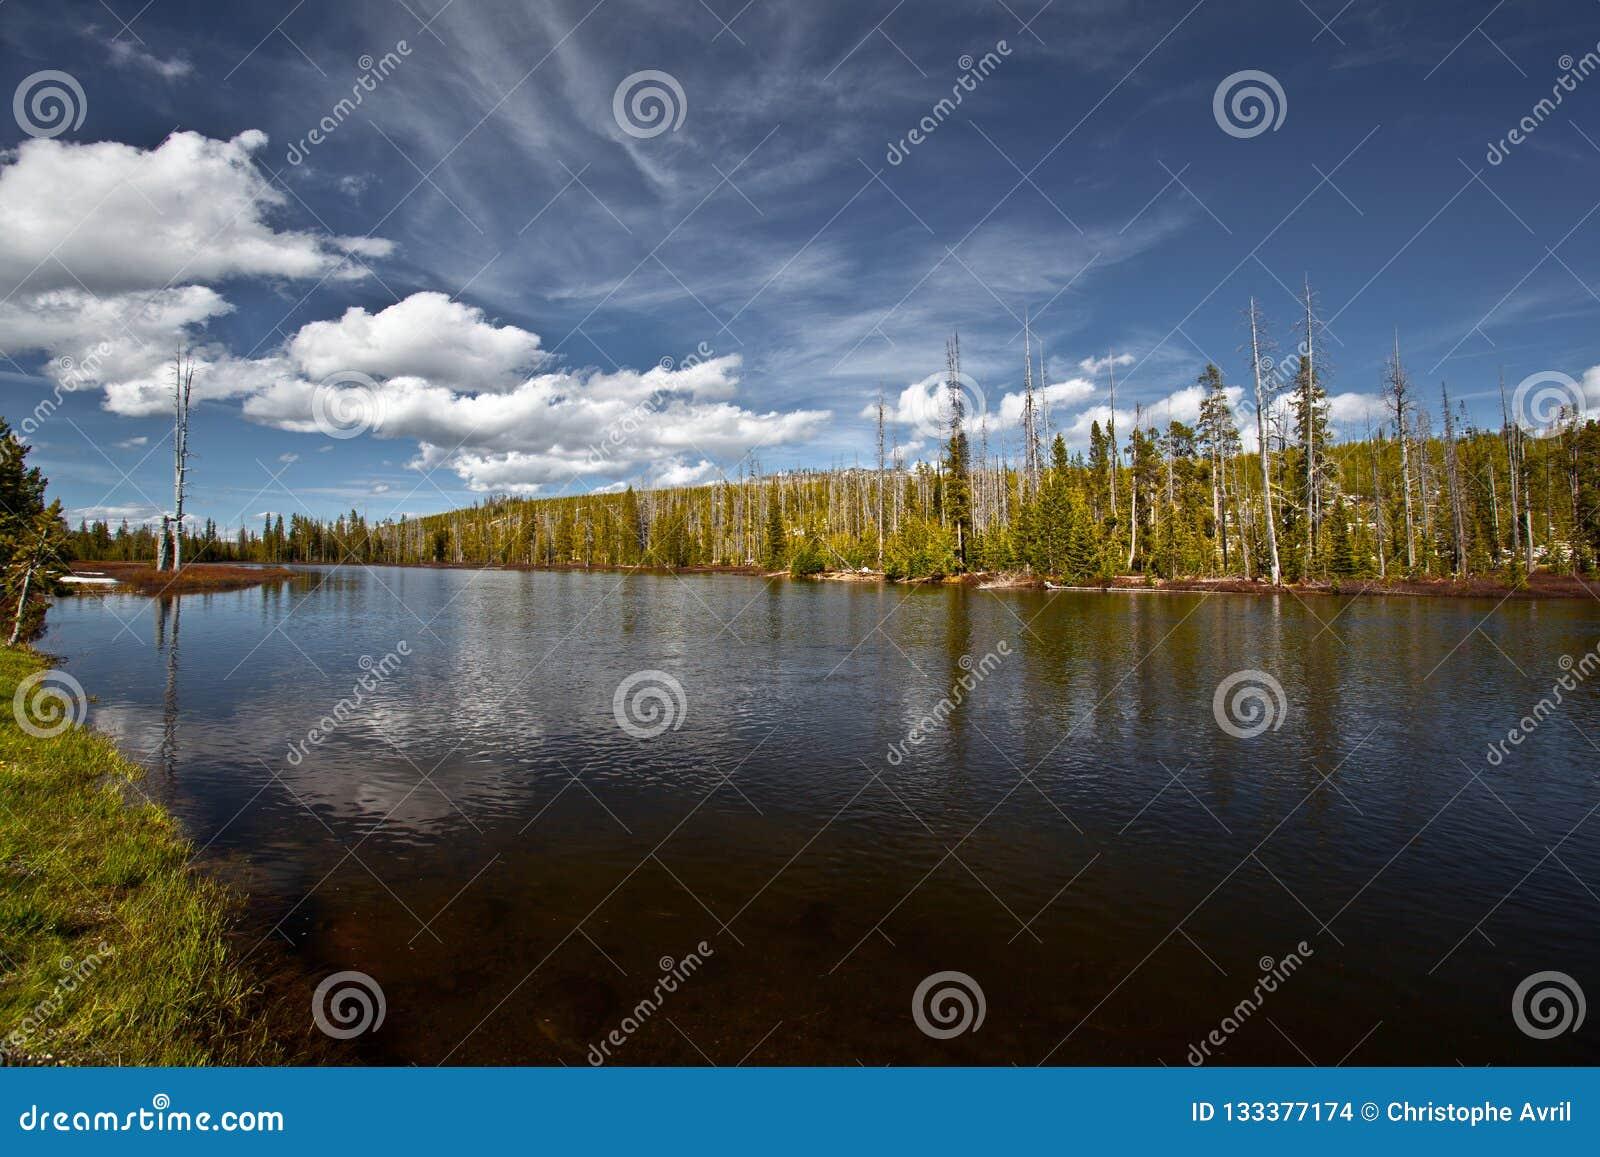 Yellowstone parka narodowego sceneria